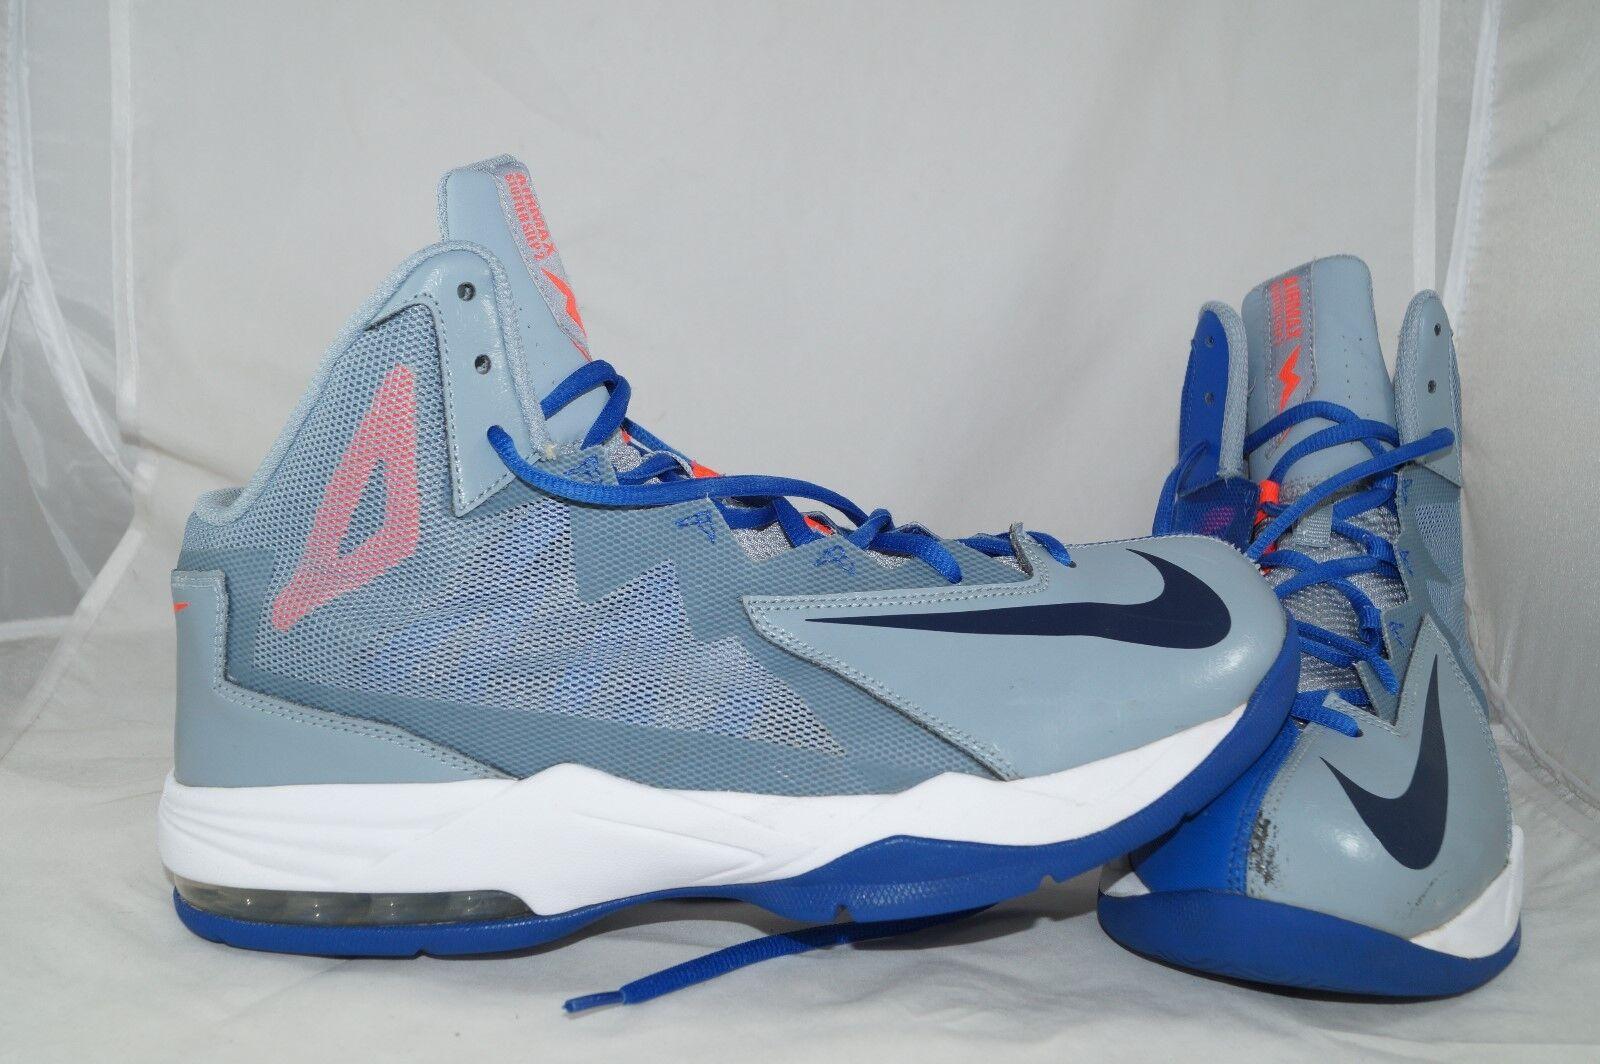 Nike Air Max Stutter Step 2 Gr: 44 Basketballschuhe Mid High Tops